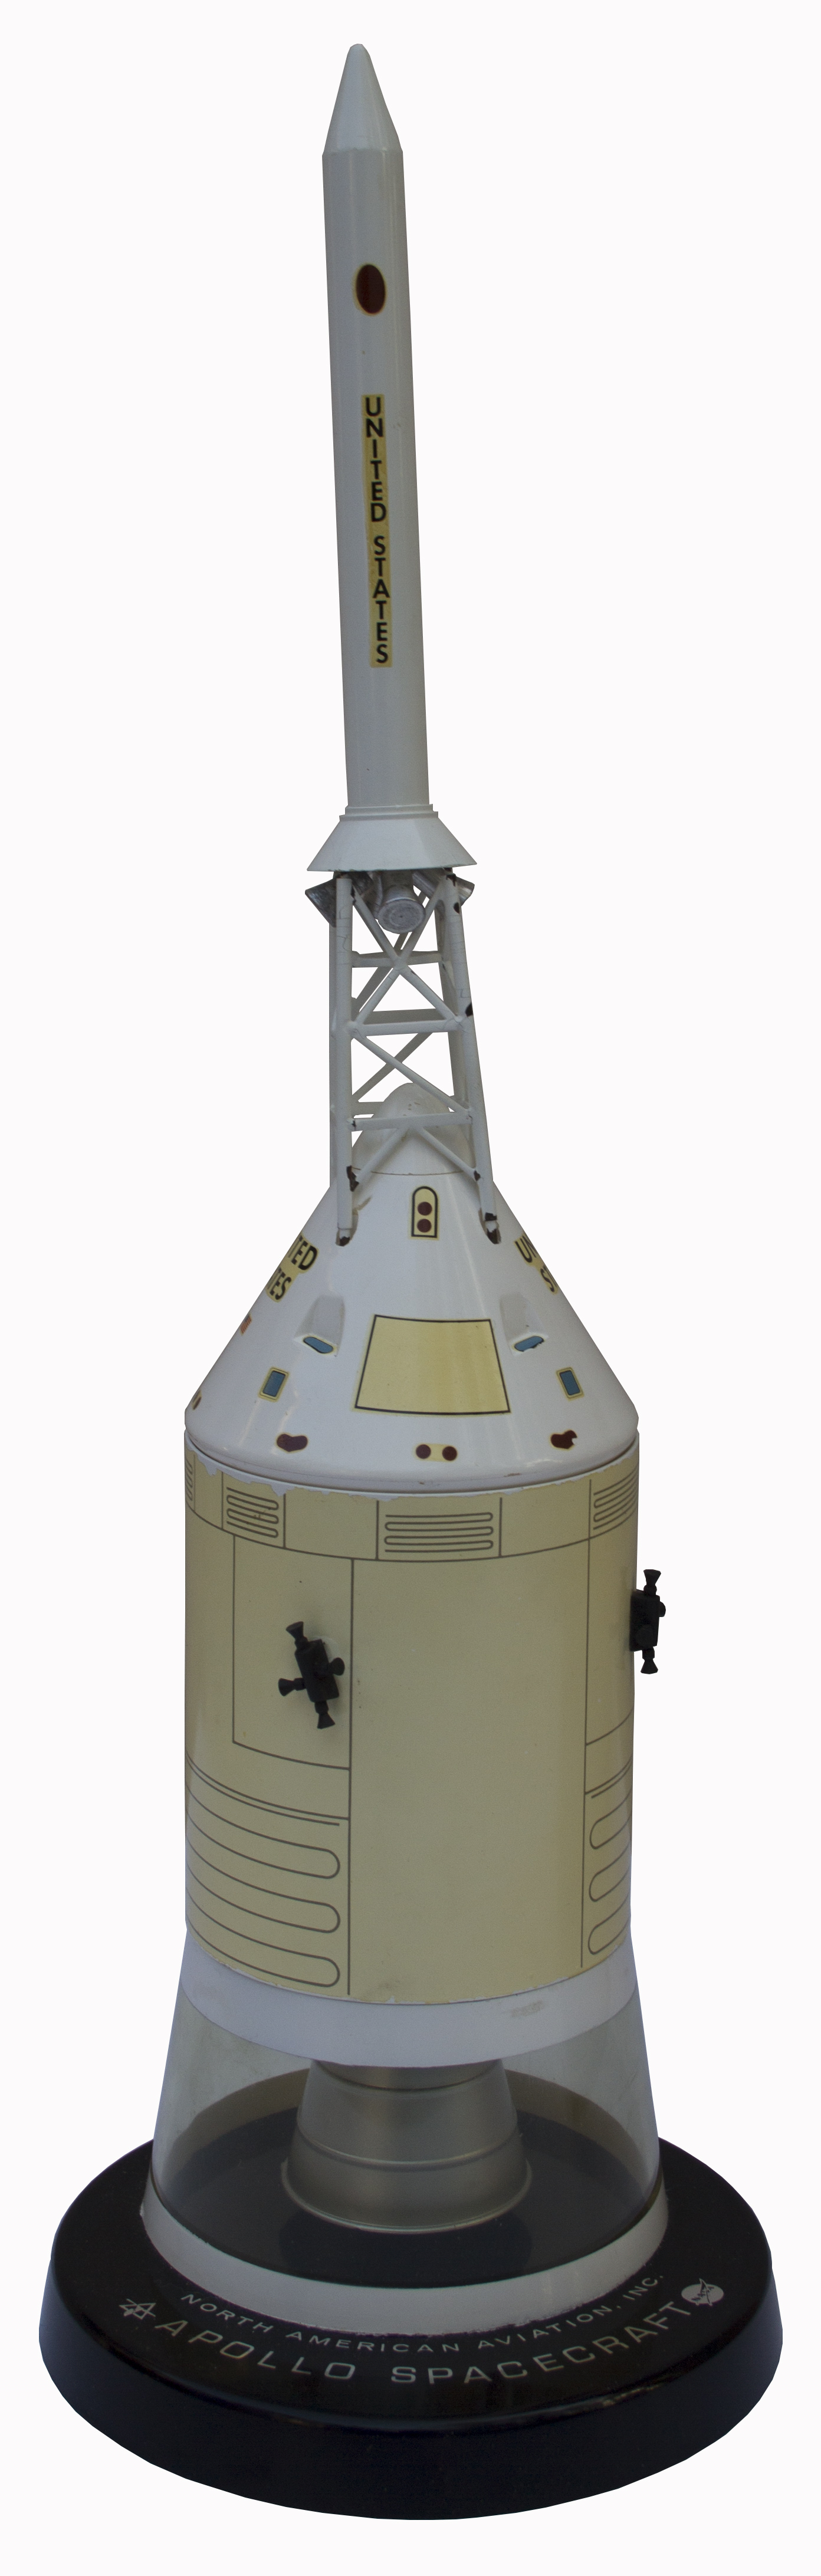 Apollo Rocket Model Sells at NateDSanders.com Auctions